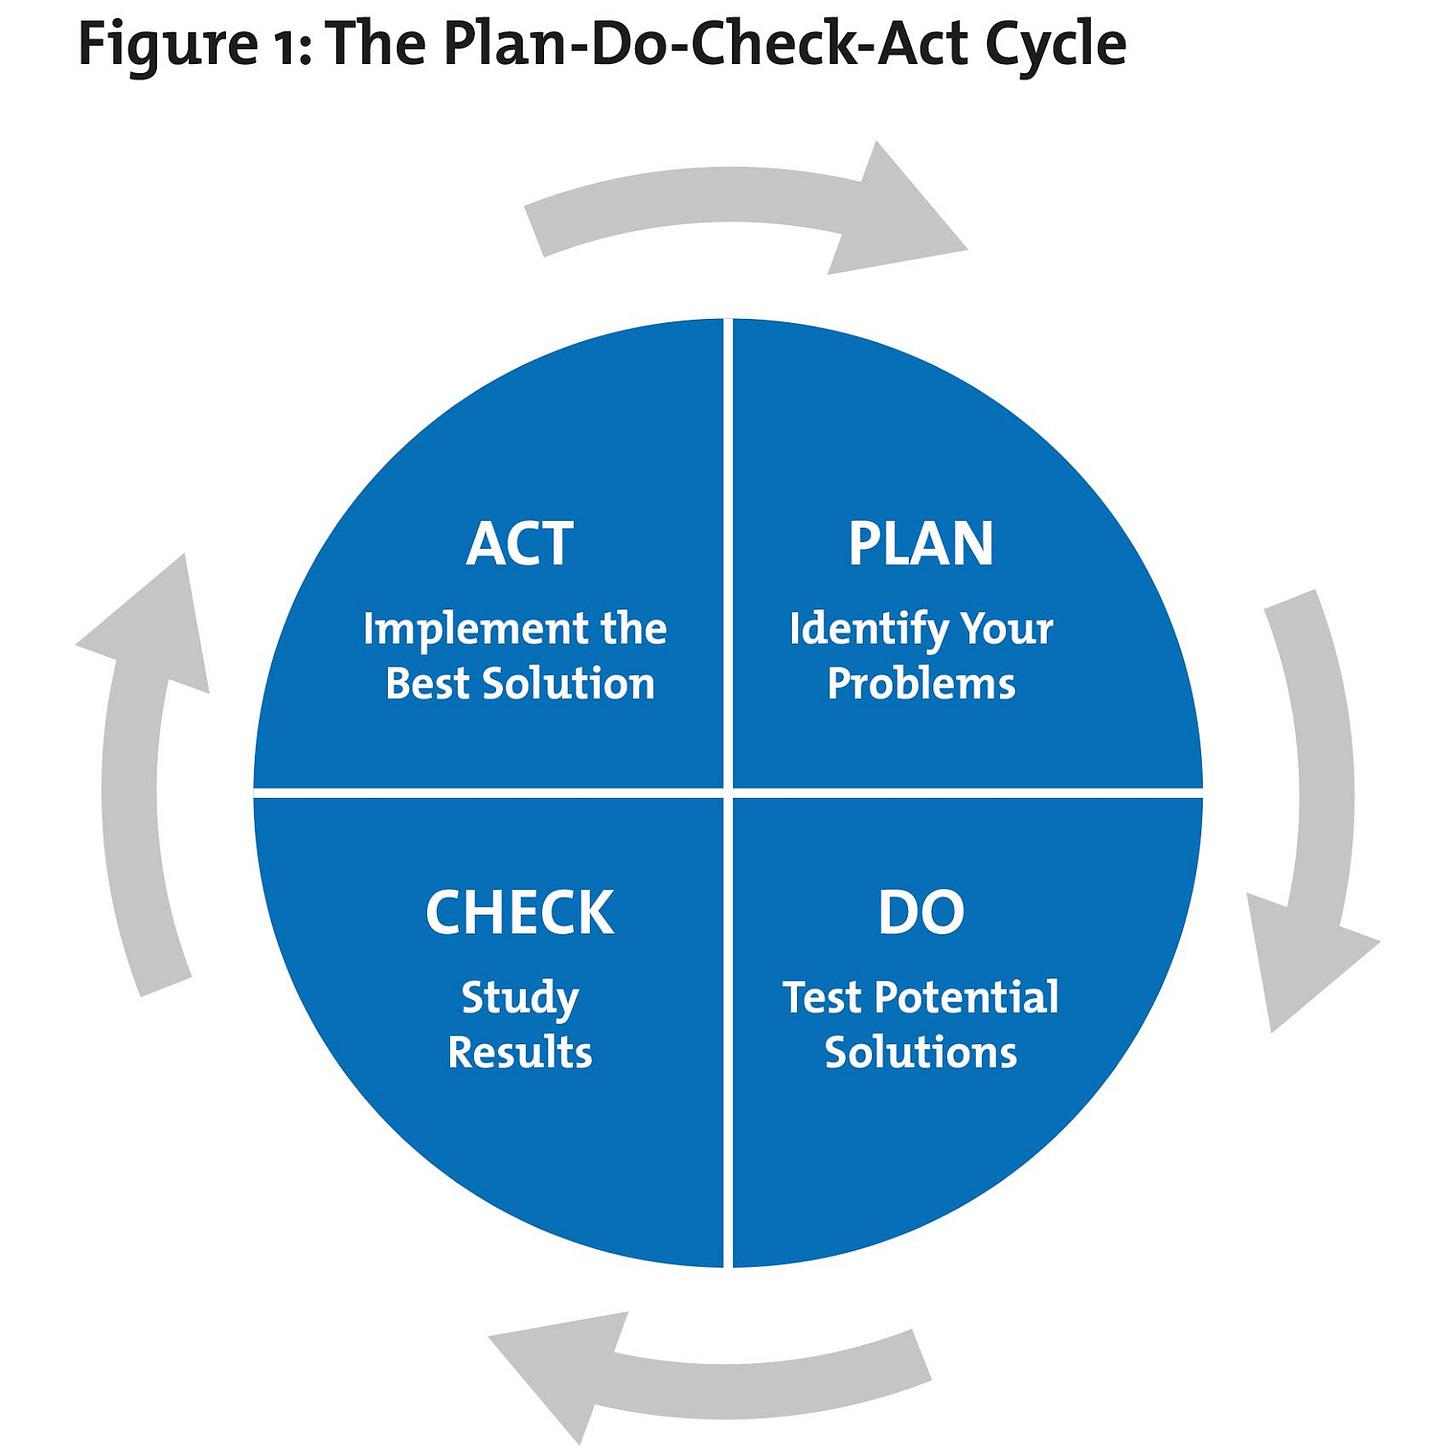 PDCA (Plan Do Check Act) - From MindTools.com